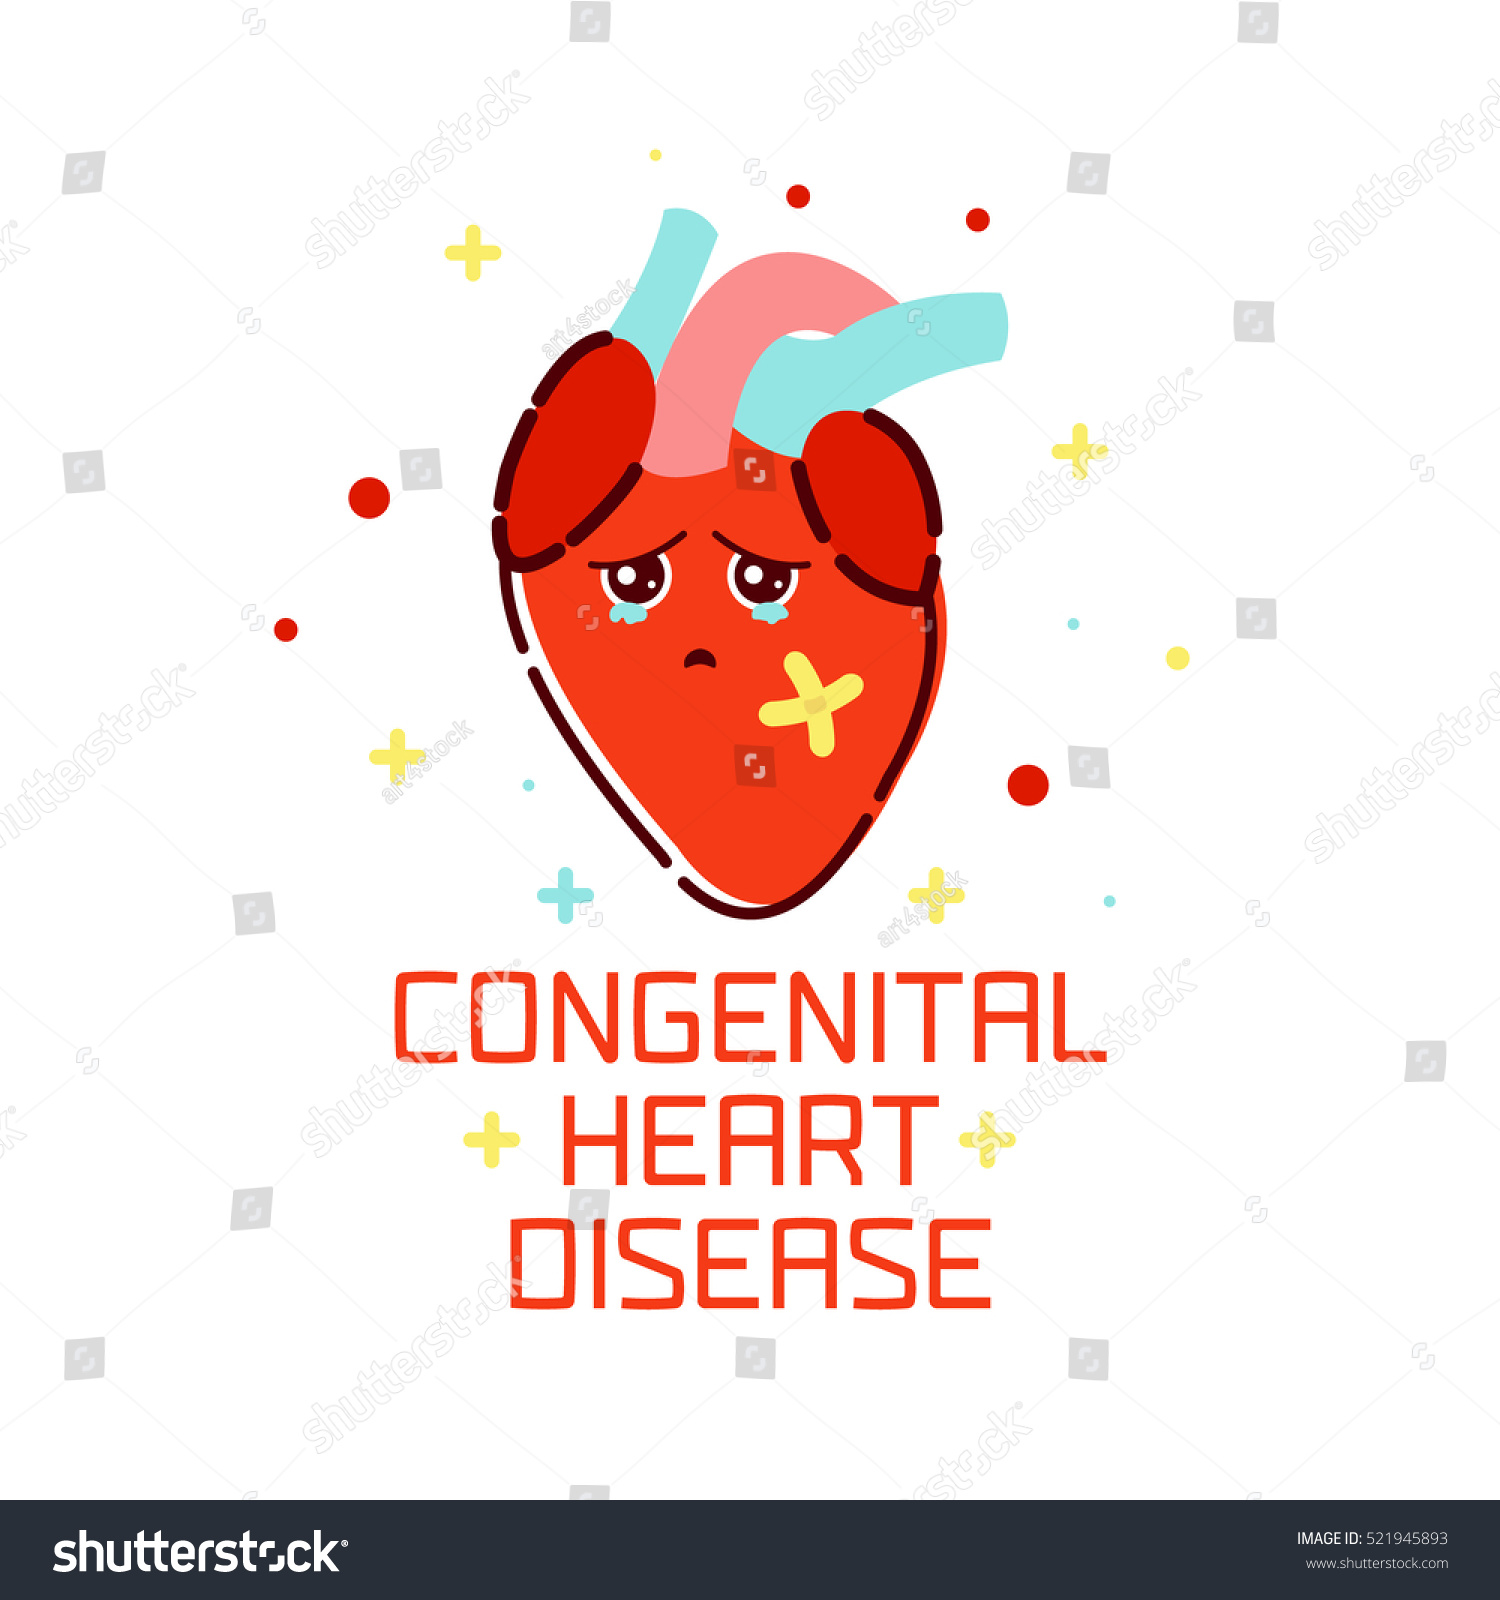 Congenital Heart Disease Awareness Poster Sad Stock Vector (2018 ...